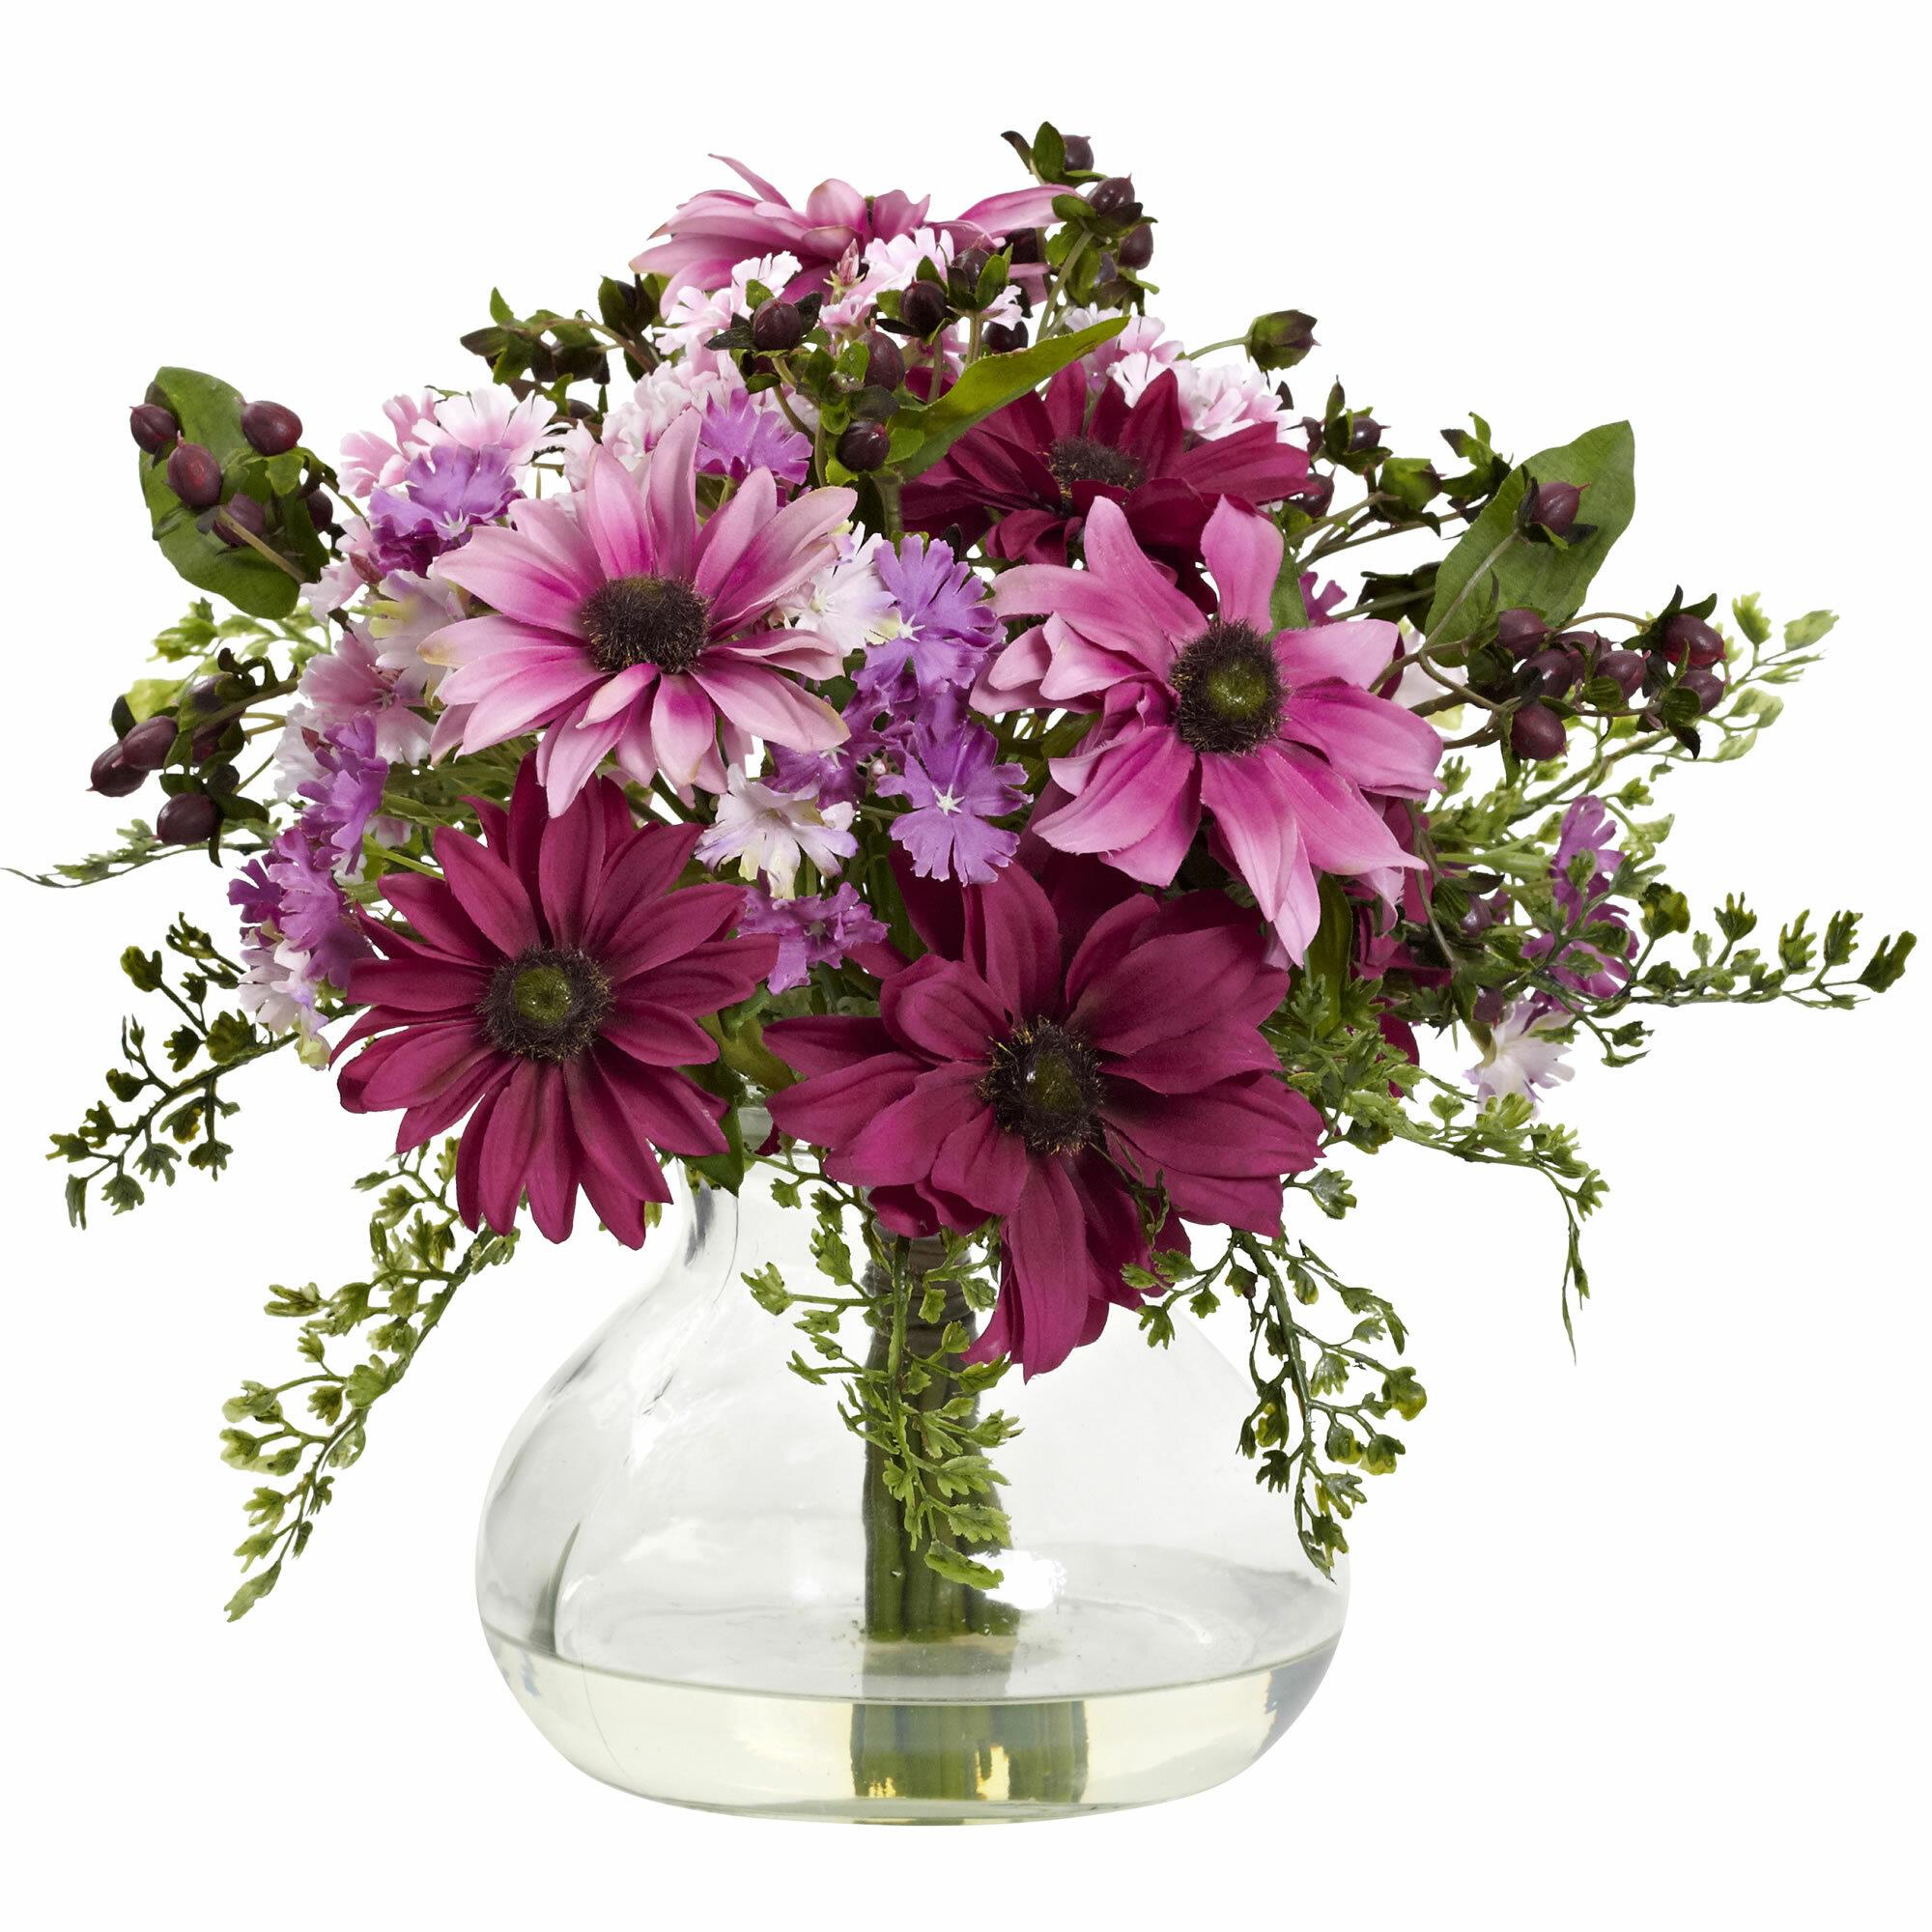 August Grove Mixed Daisy Floral Arrangement In Vase Reviews Wayfair